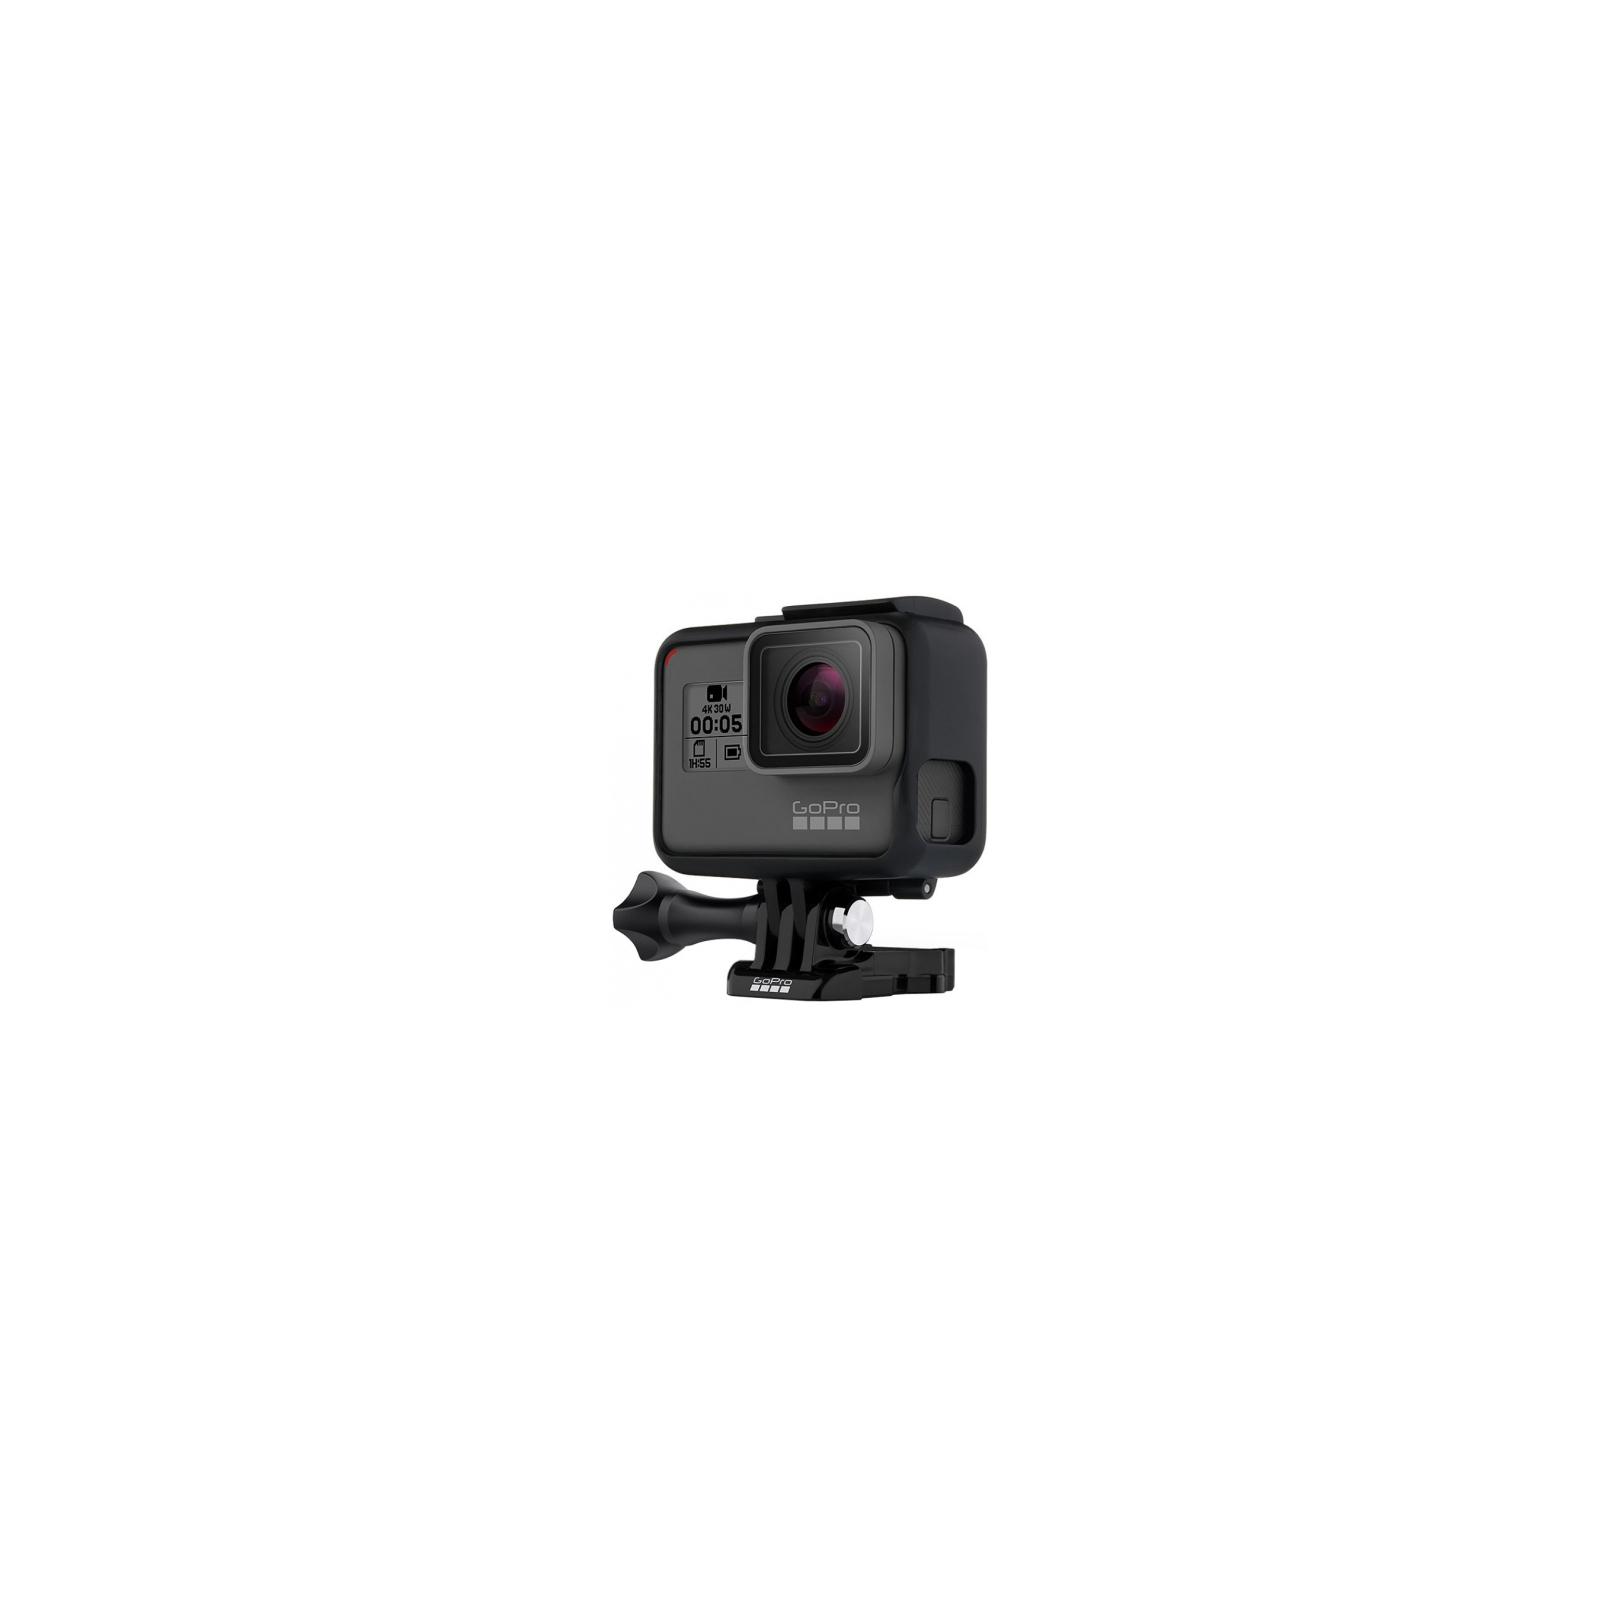 Аксессуар к экшн-камерам GoPro The Frame (AAFRM-001) изображение 2